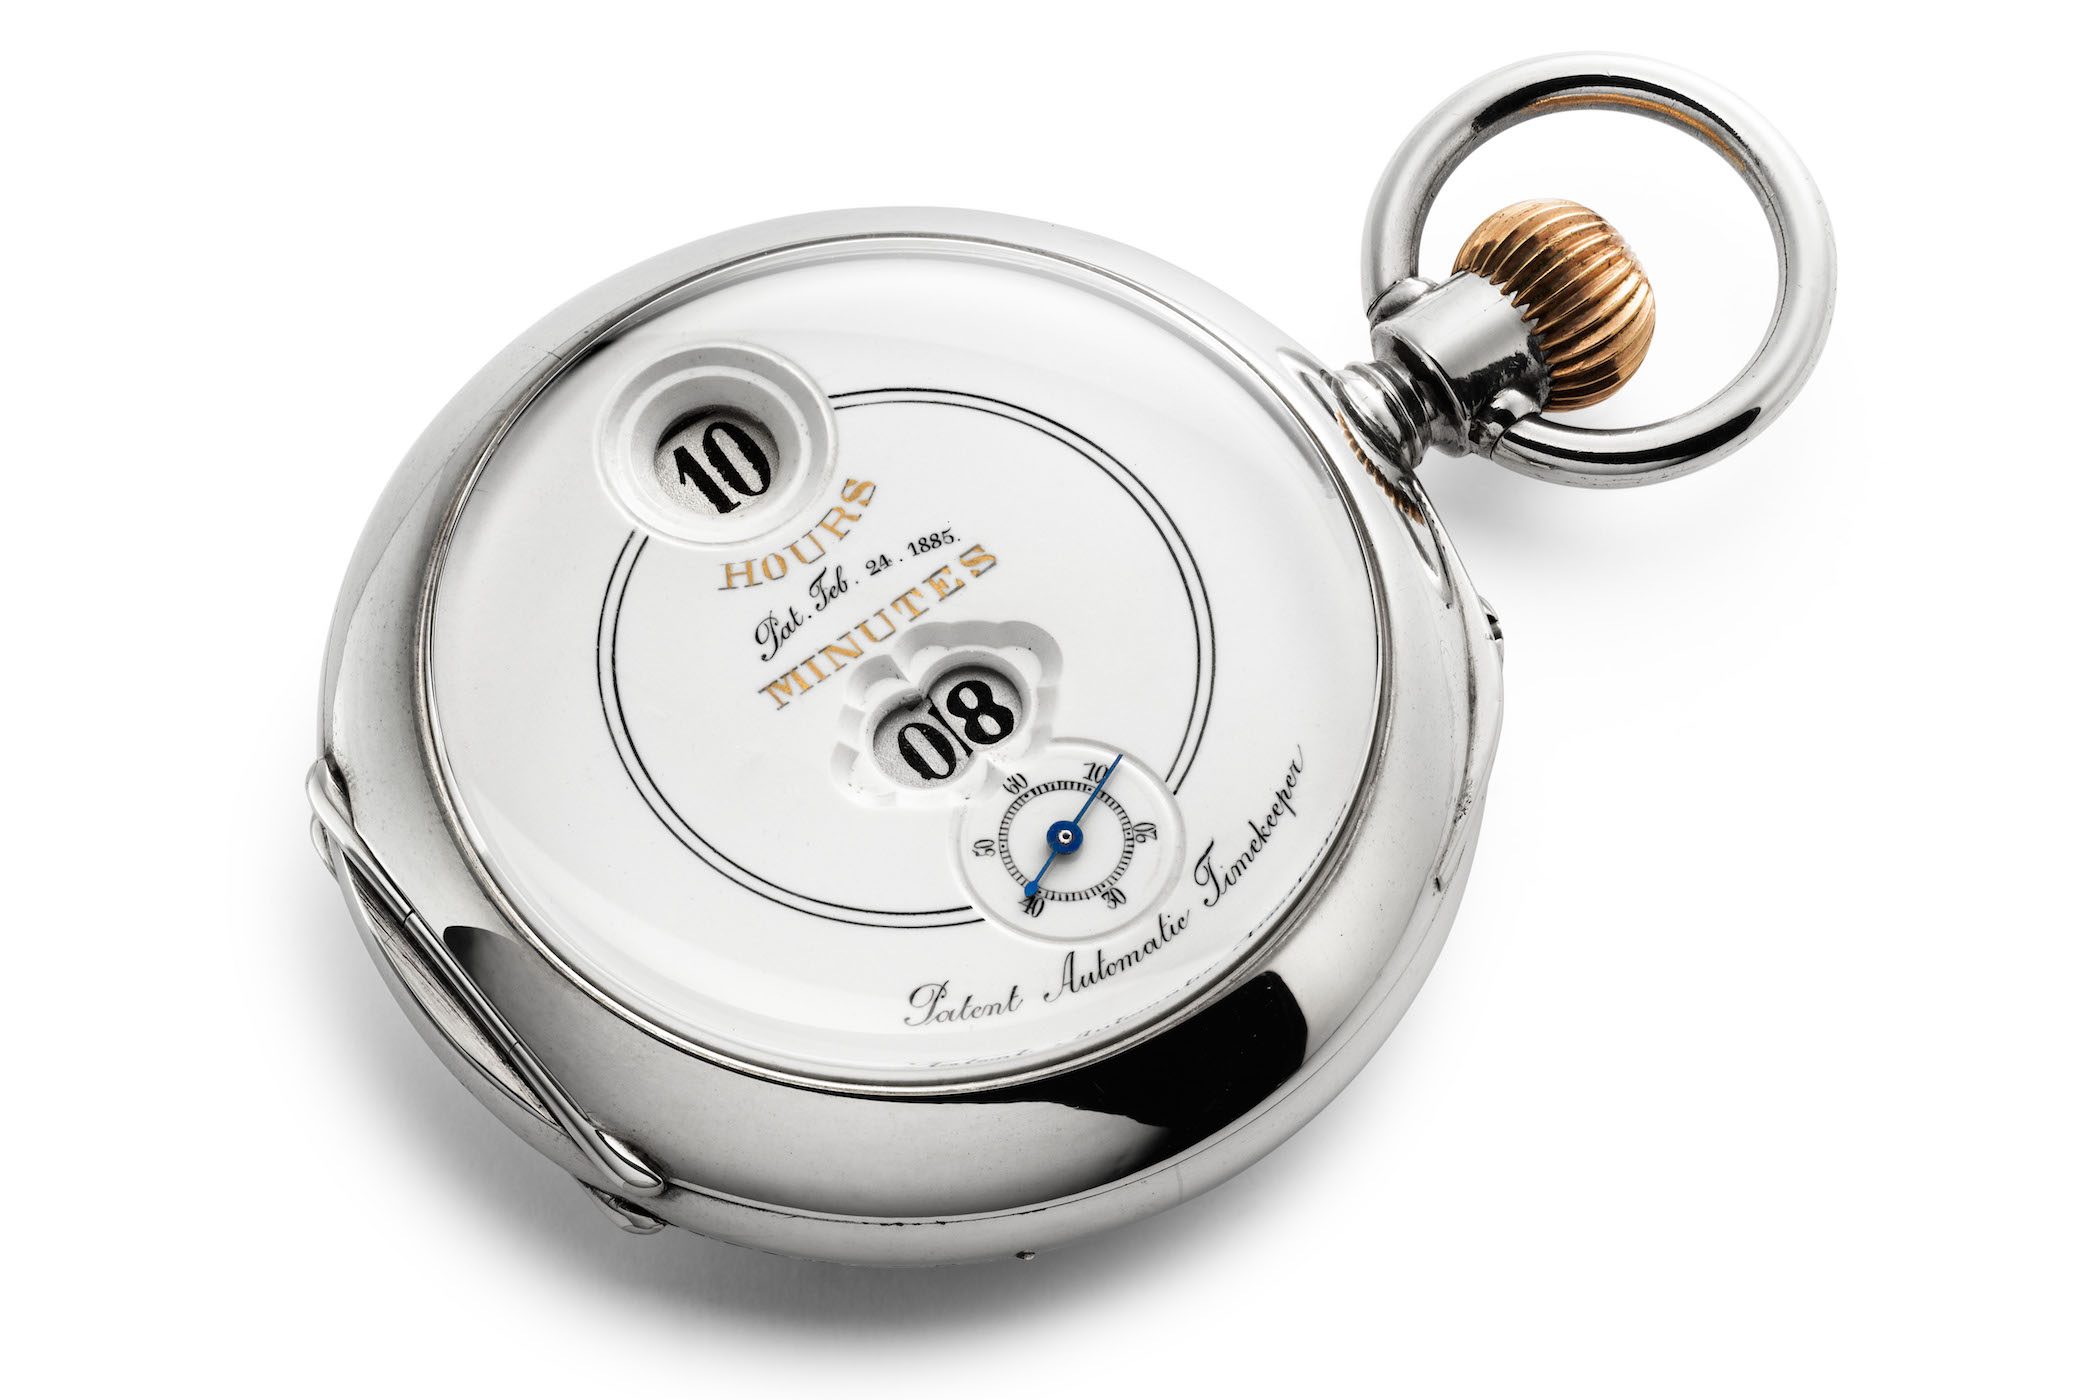 IWC pallweber pocket watch